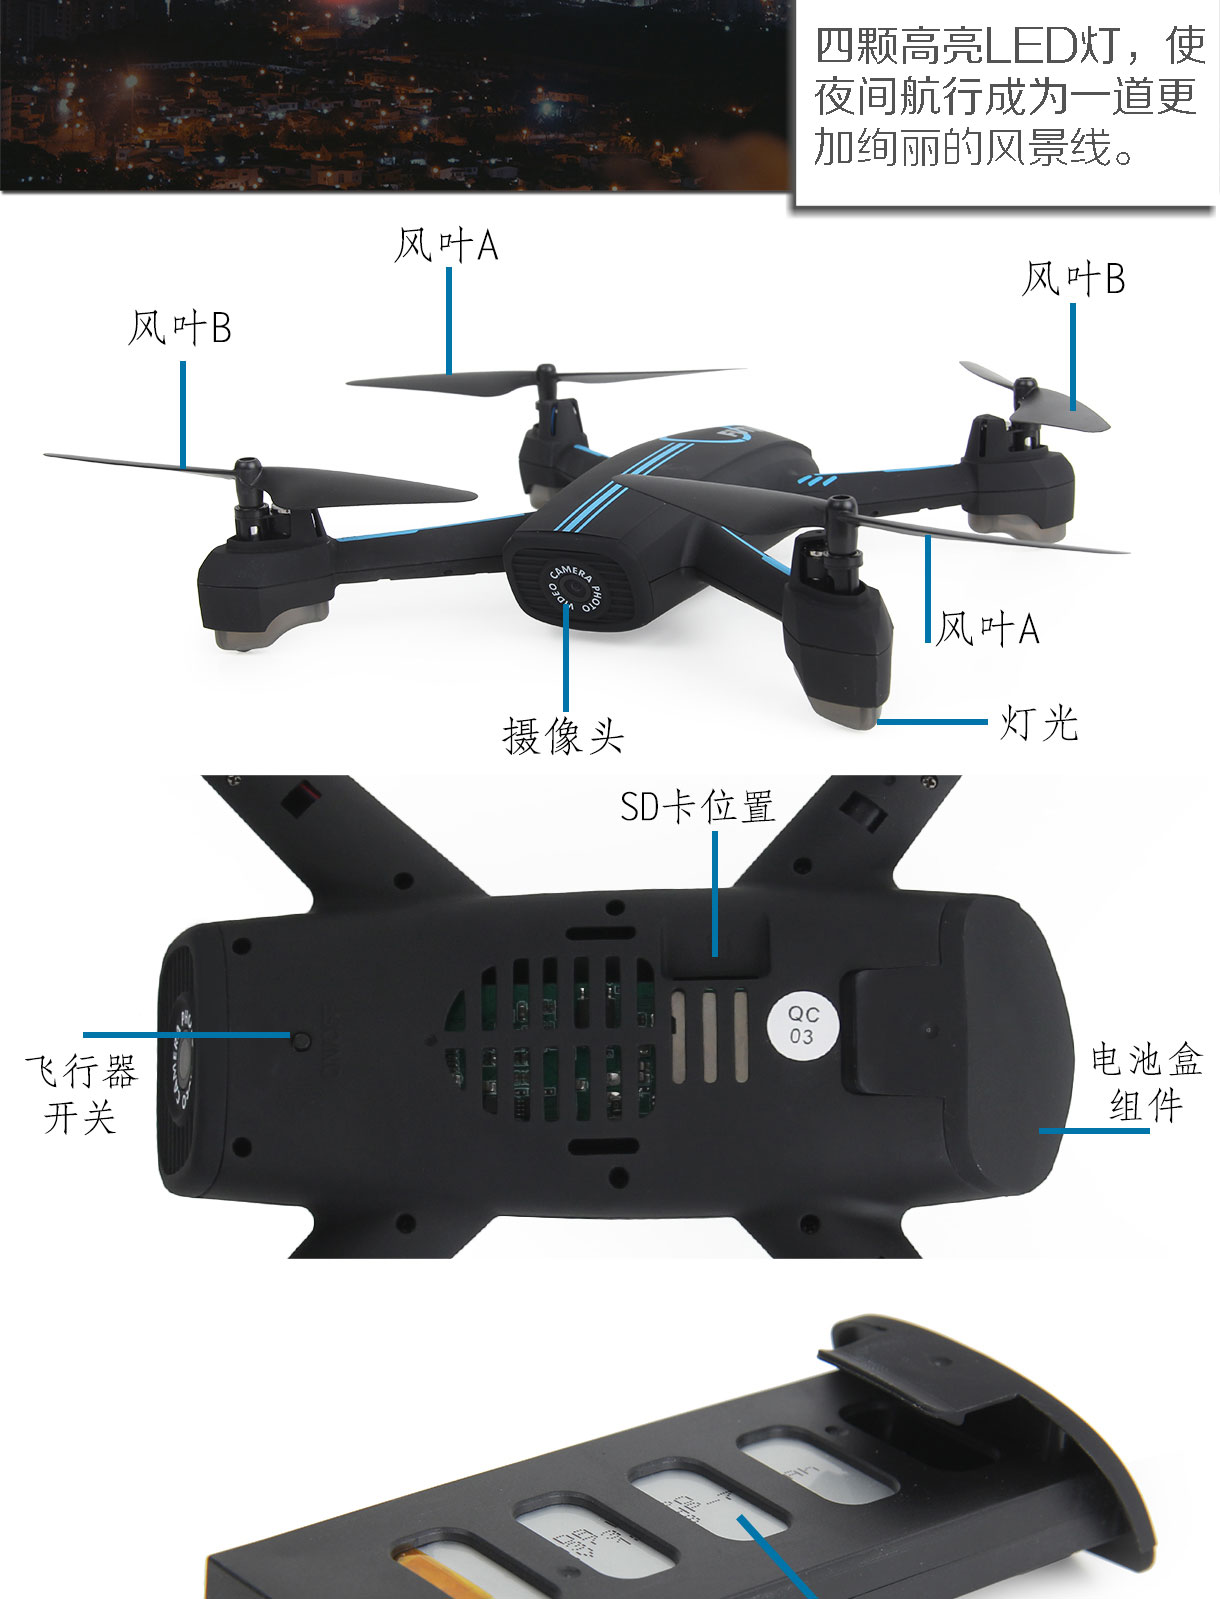 WIFI FPV RC Drone GPS Mining Point Drone 528 RC Quadcopter Full HD 720P Cámara una tecla de salida/aterrizaje/parada vuelo estable - 6